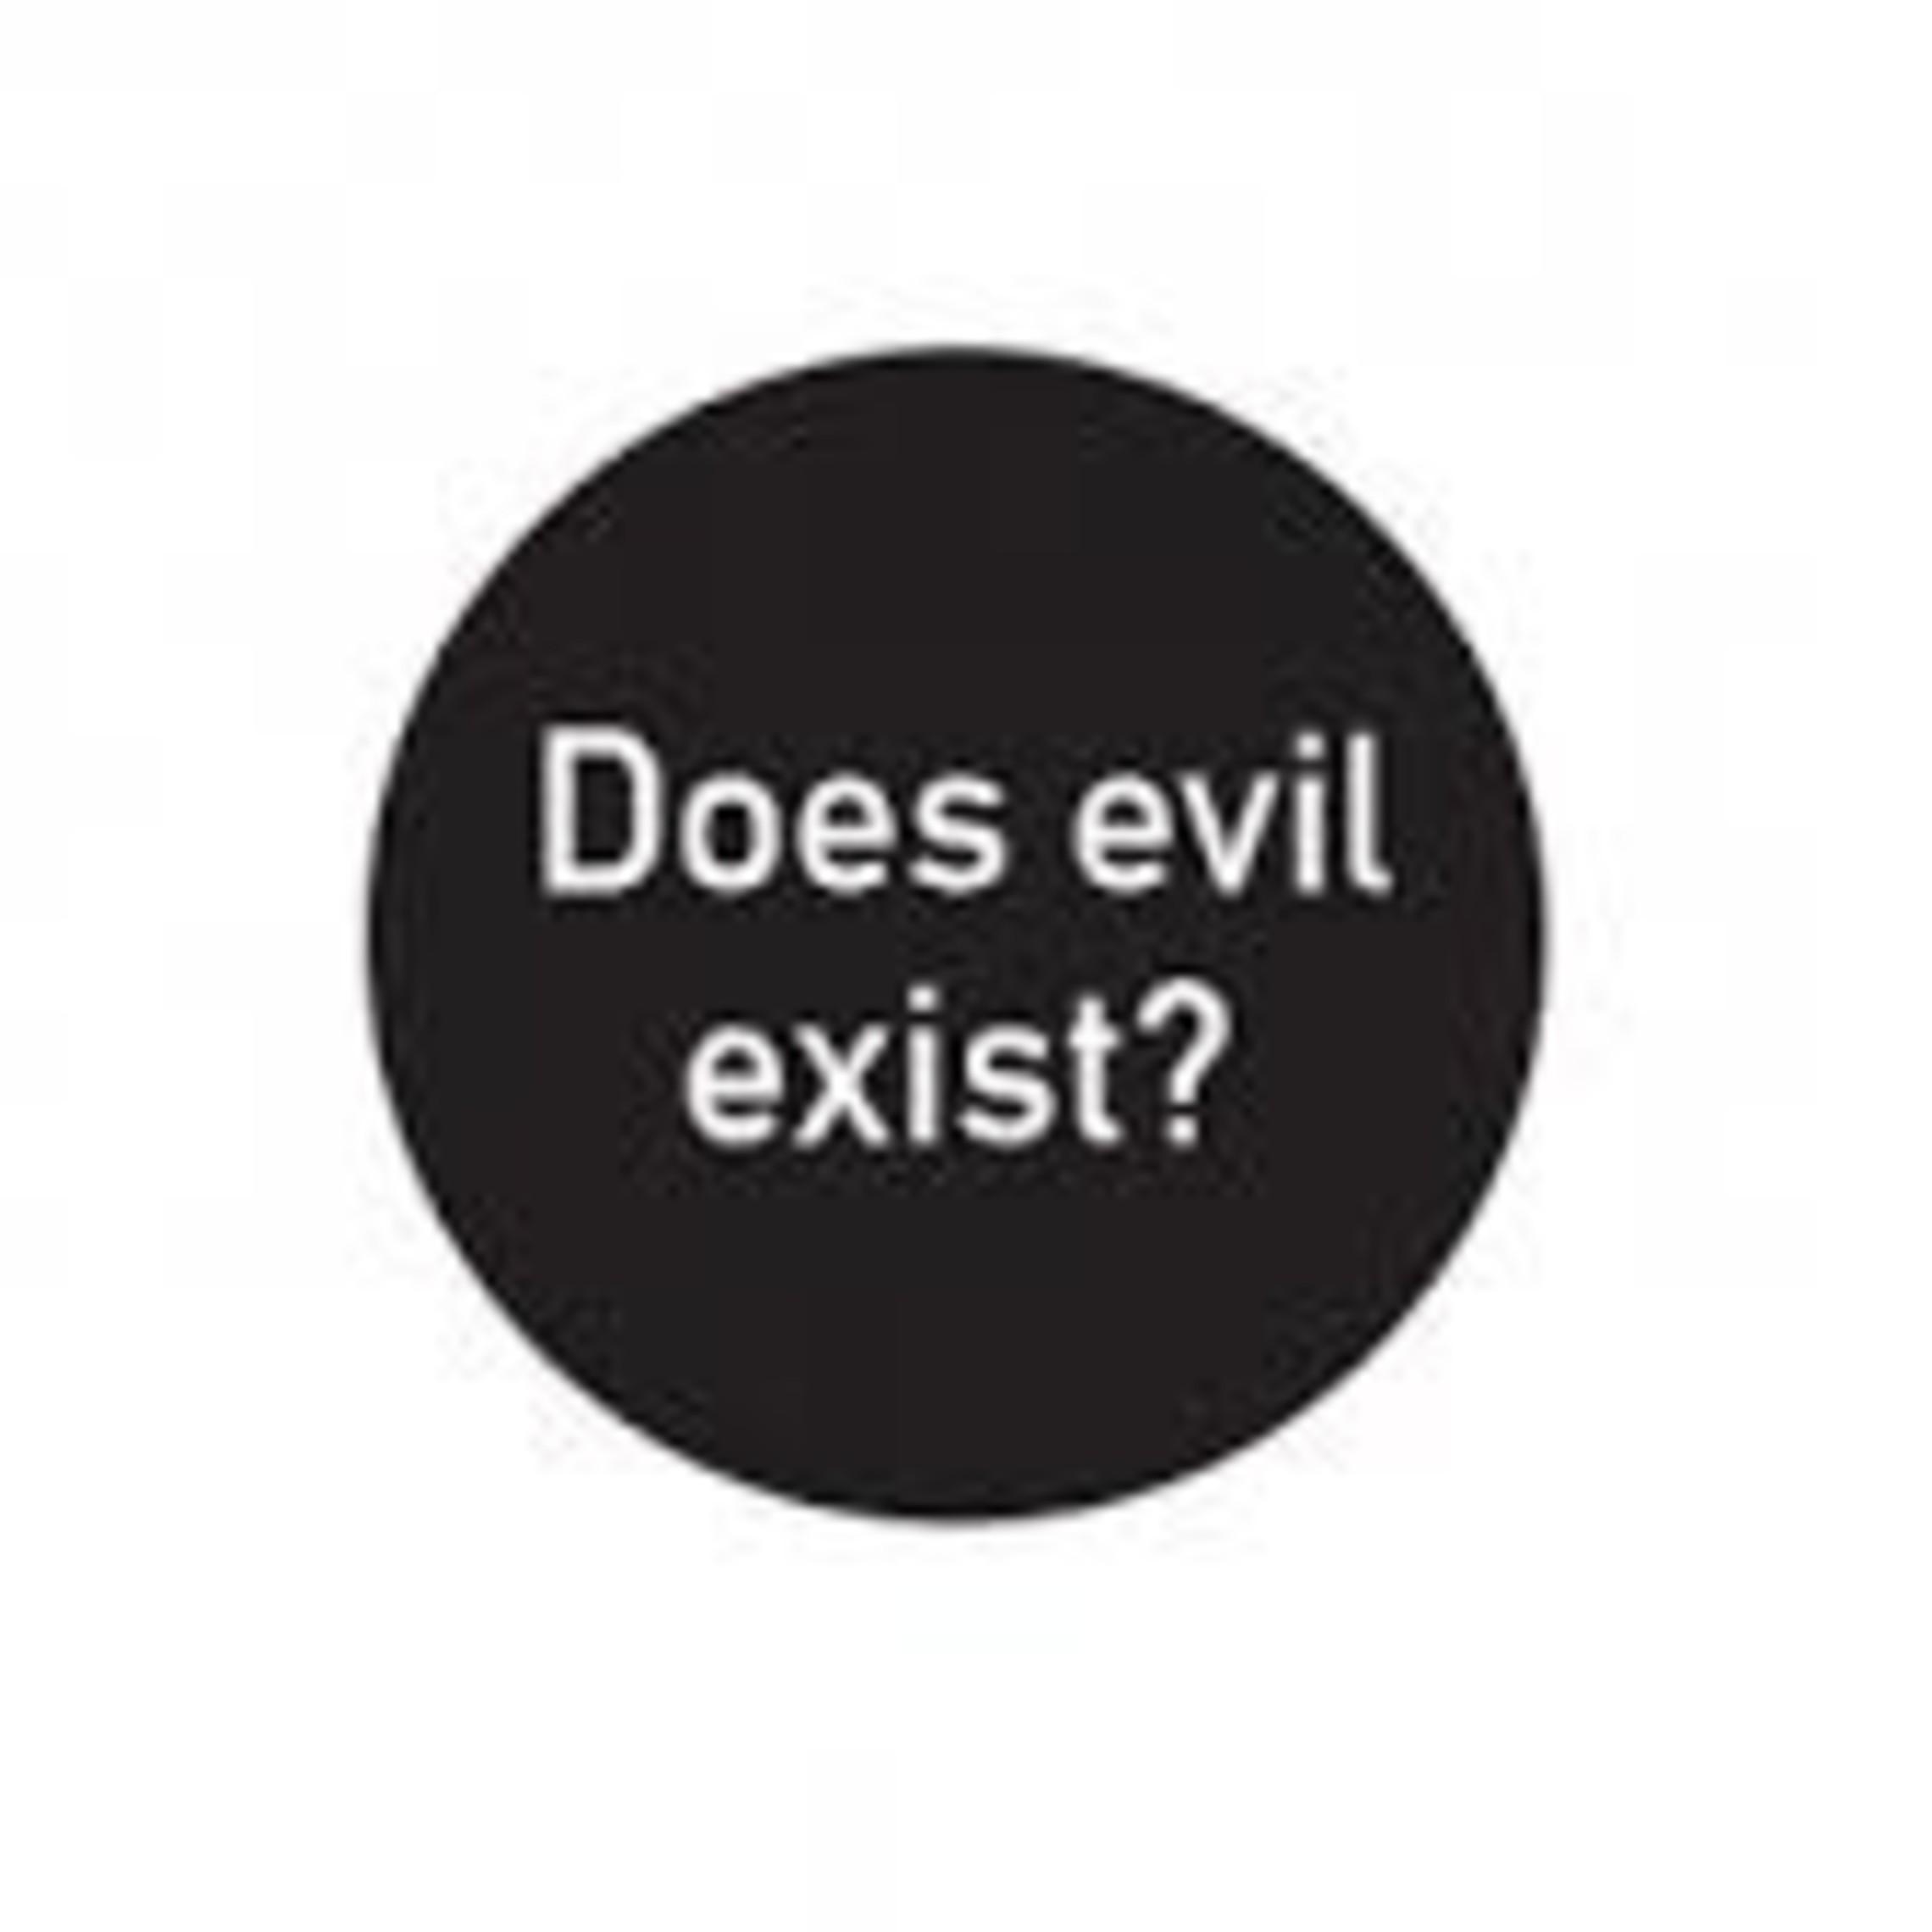 Evil Exist